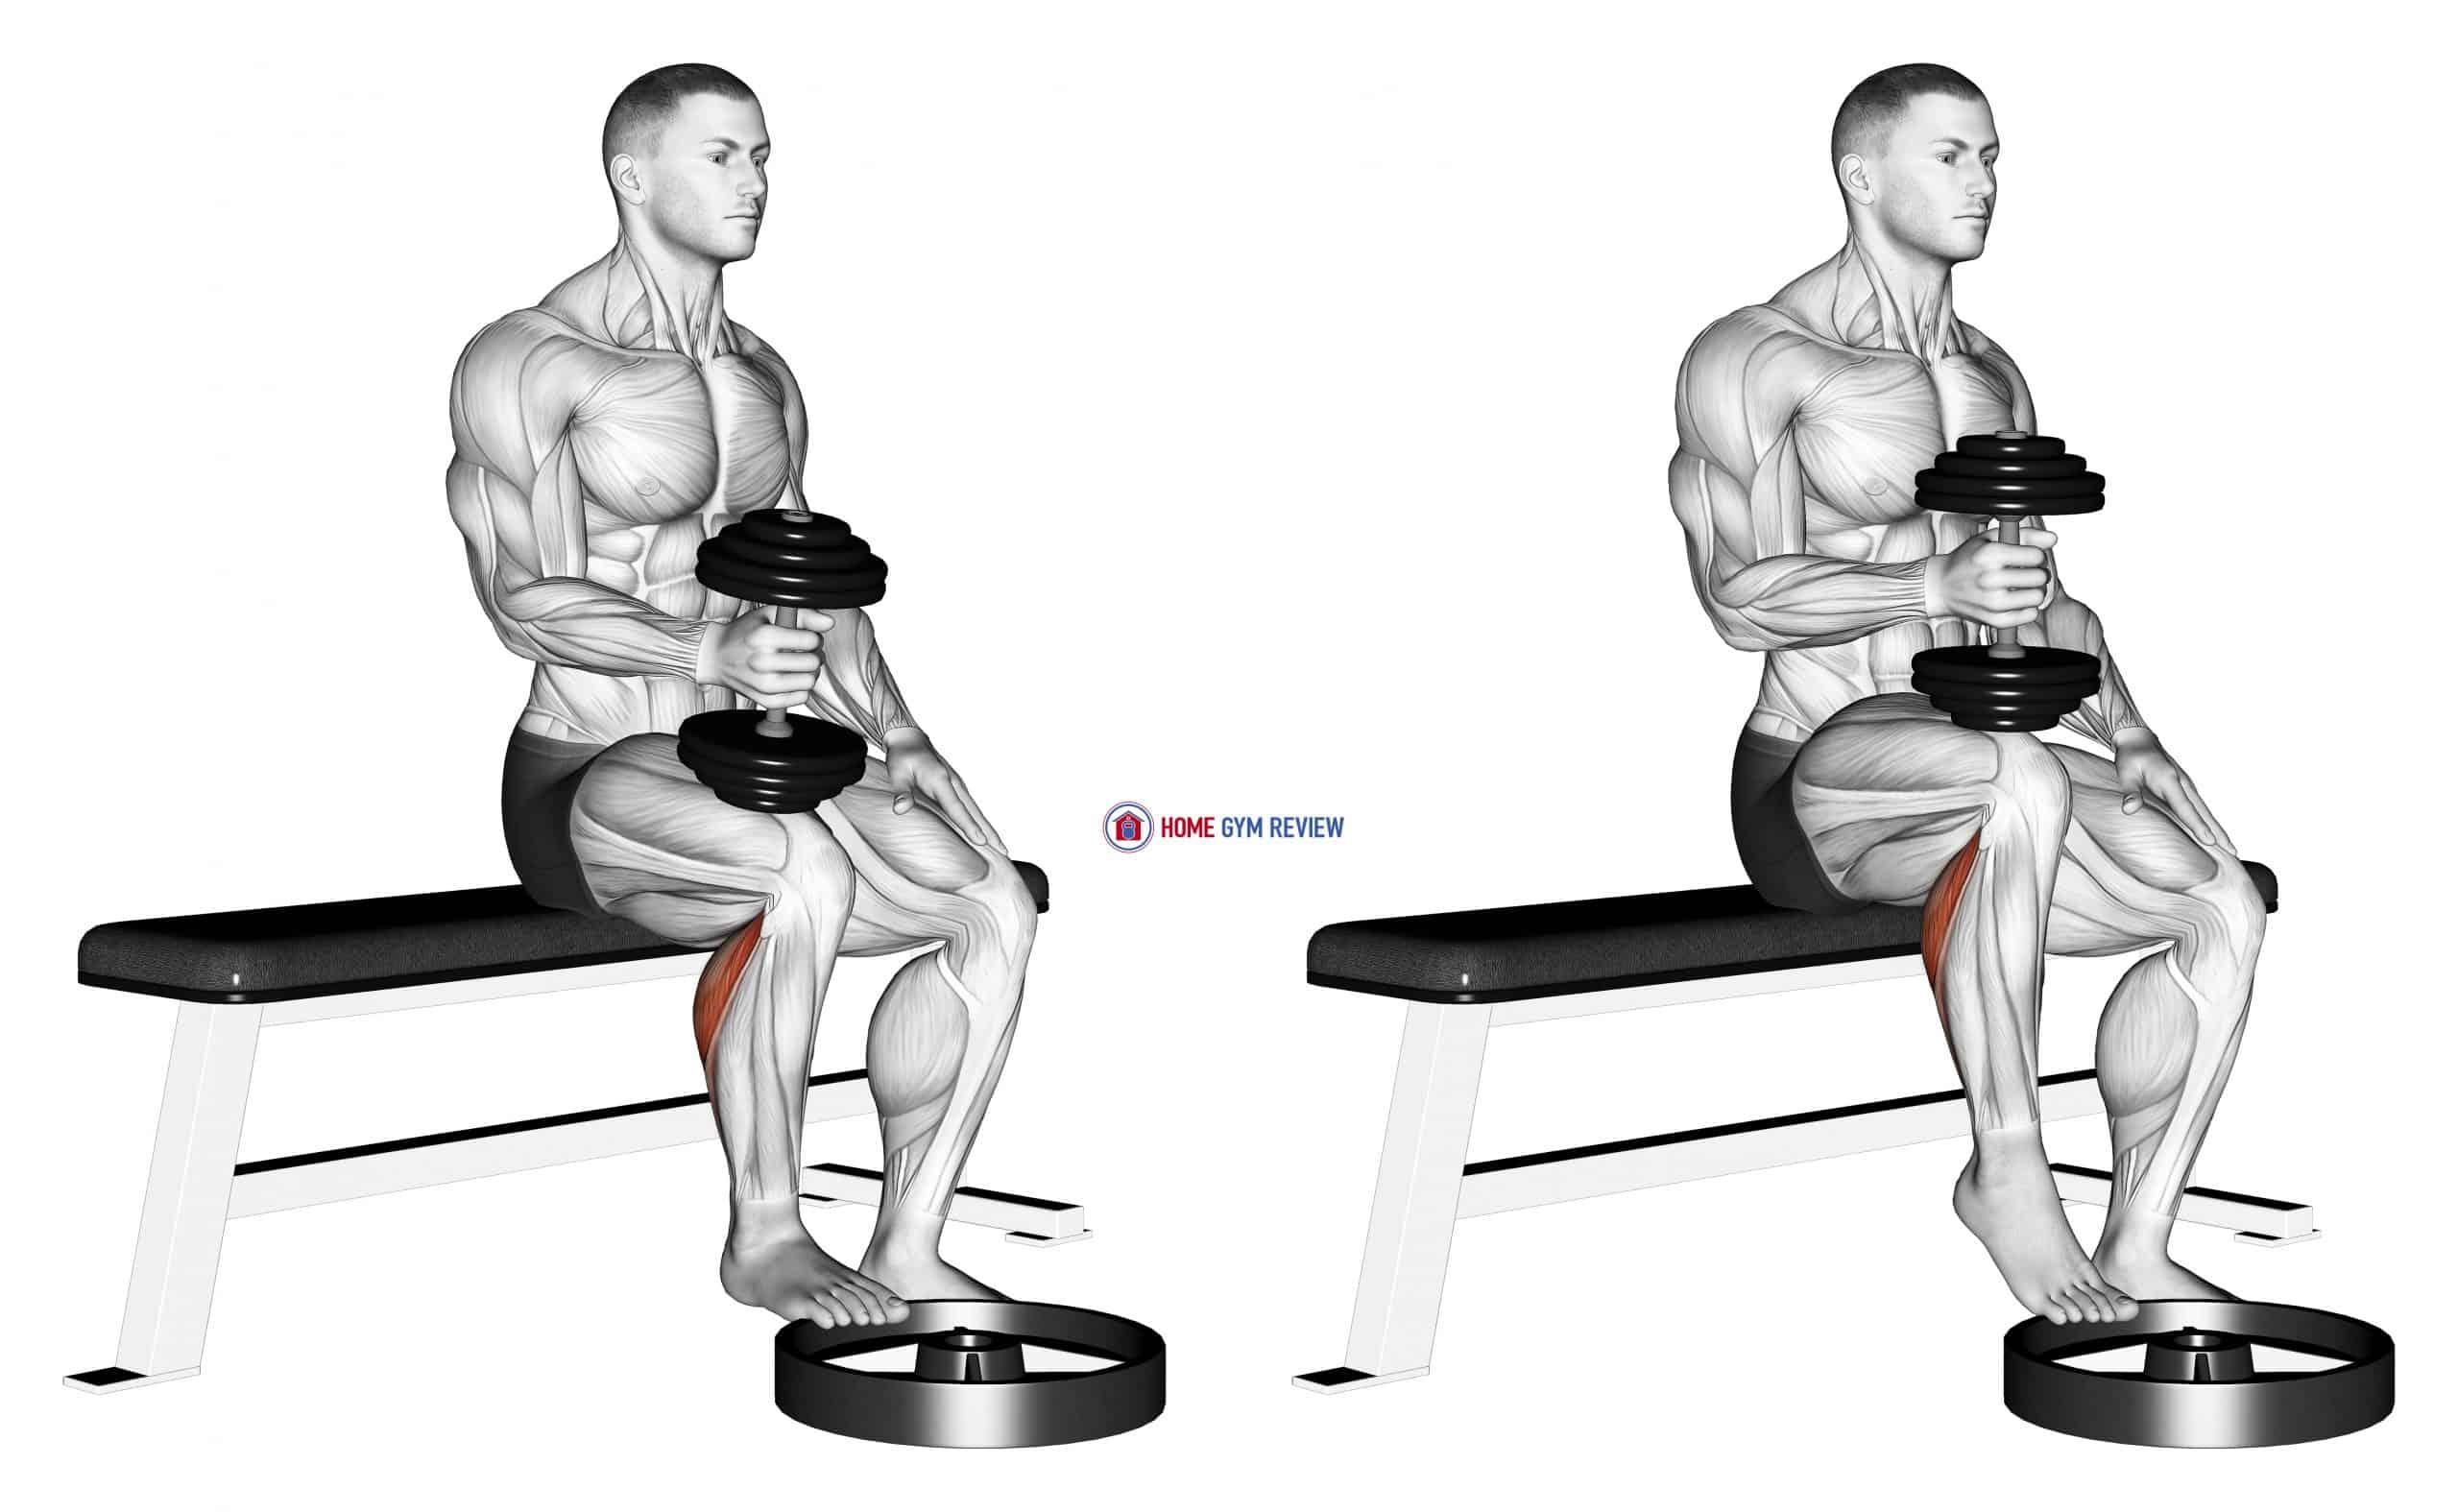 Dumbbell Seated One Leg Calf Raise - Hammer Grip